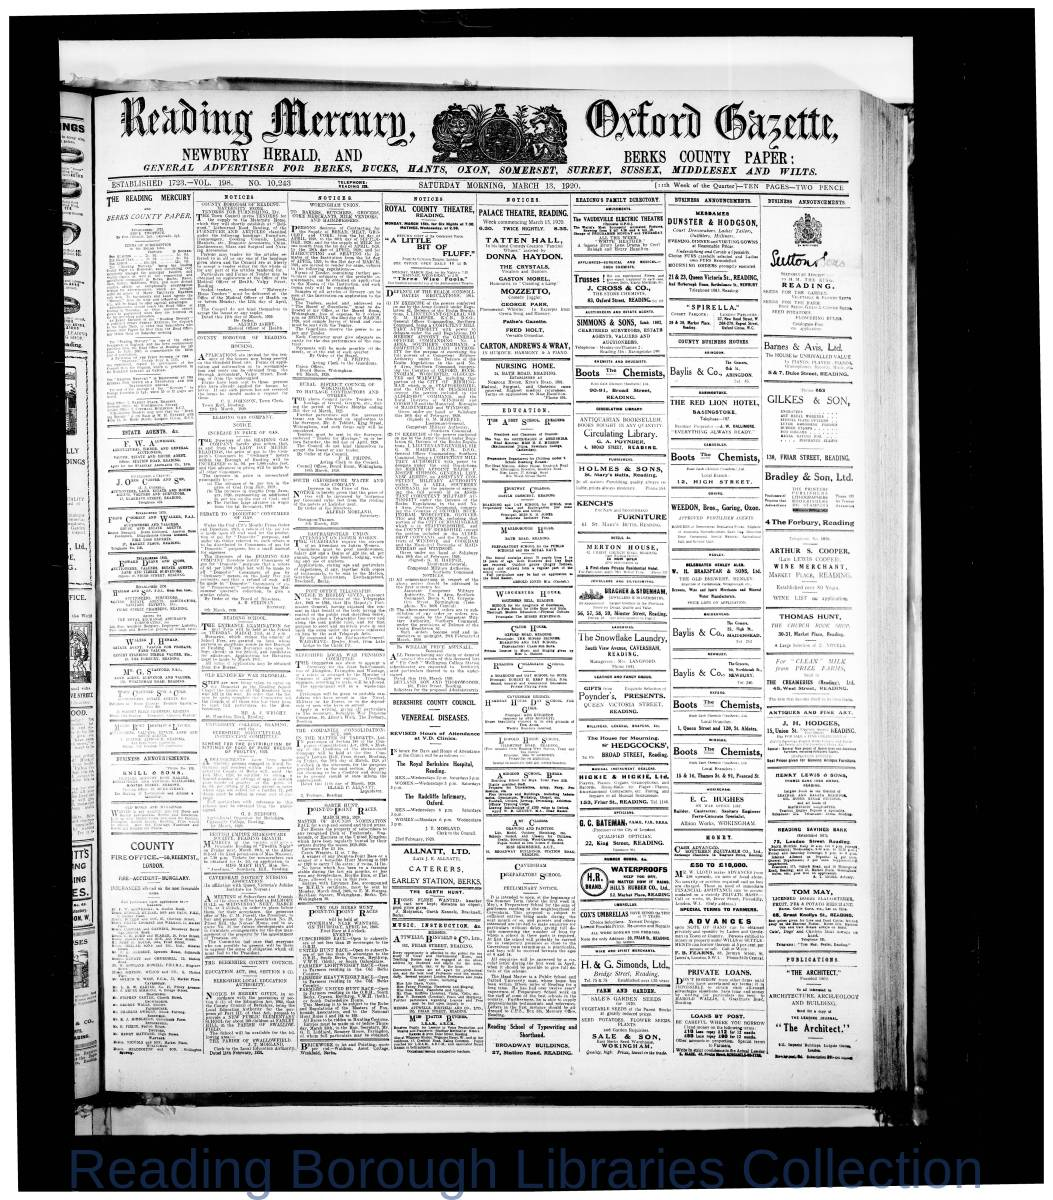 Reading Mercury Oxford Gazette Saturday, March 13, 1920. Pg 1